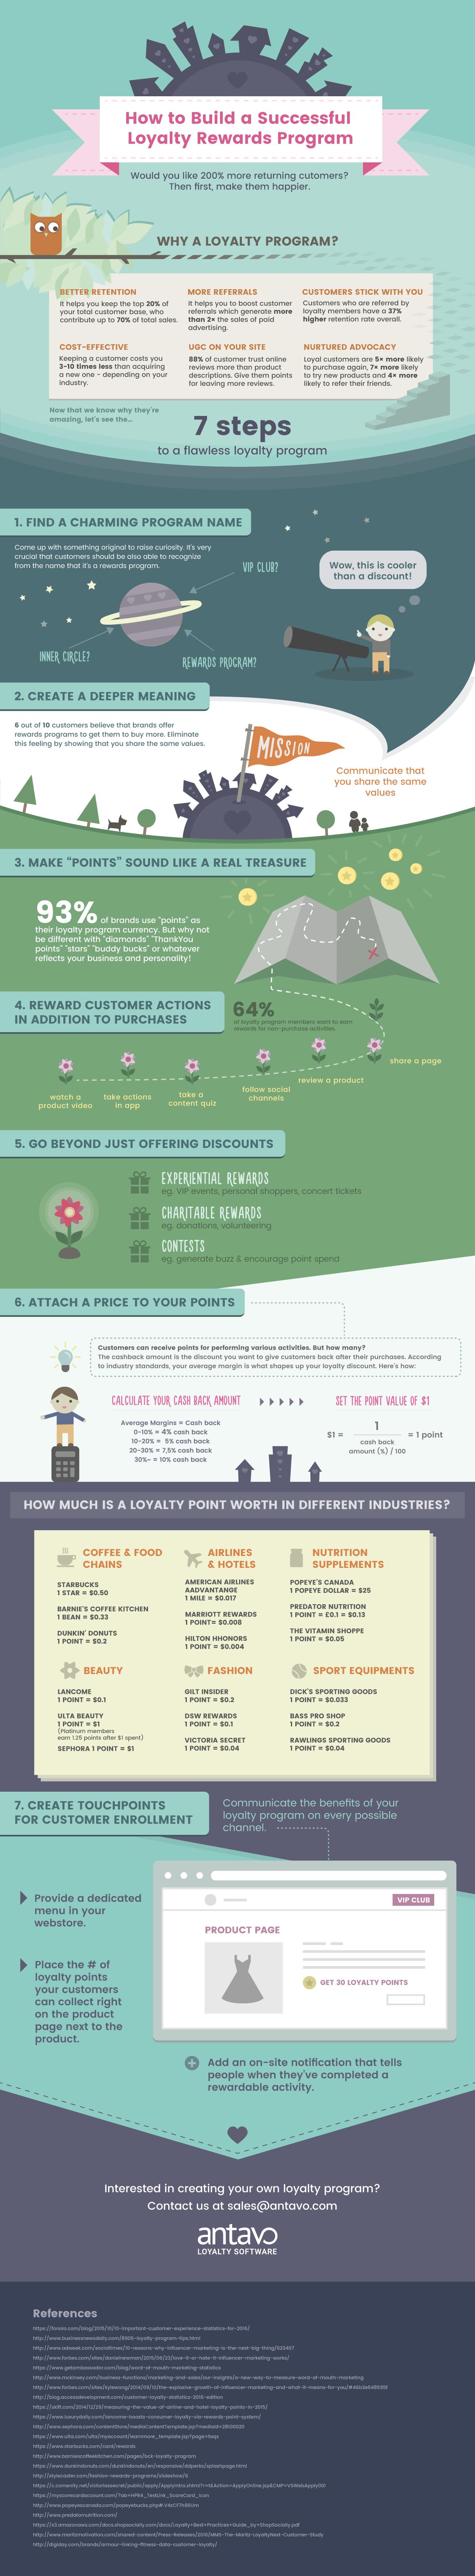 loyalty-rewards-program-infographic.png